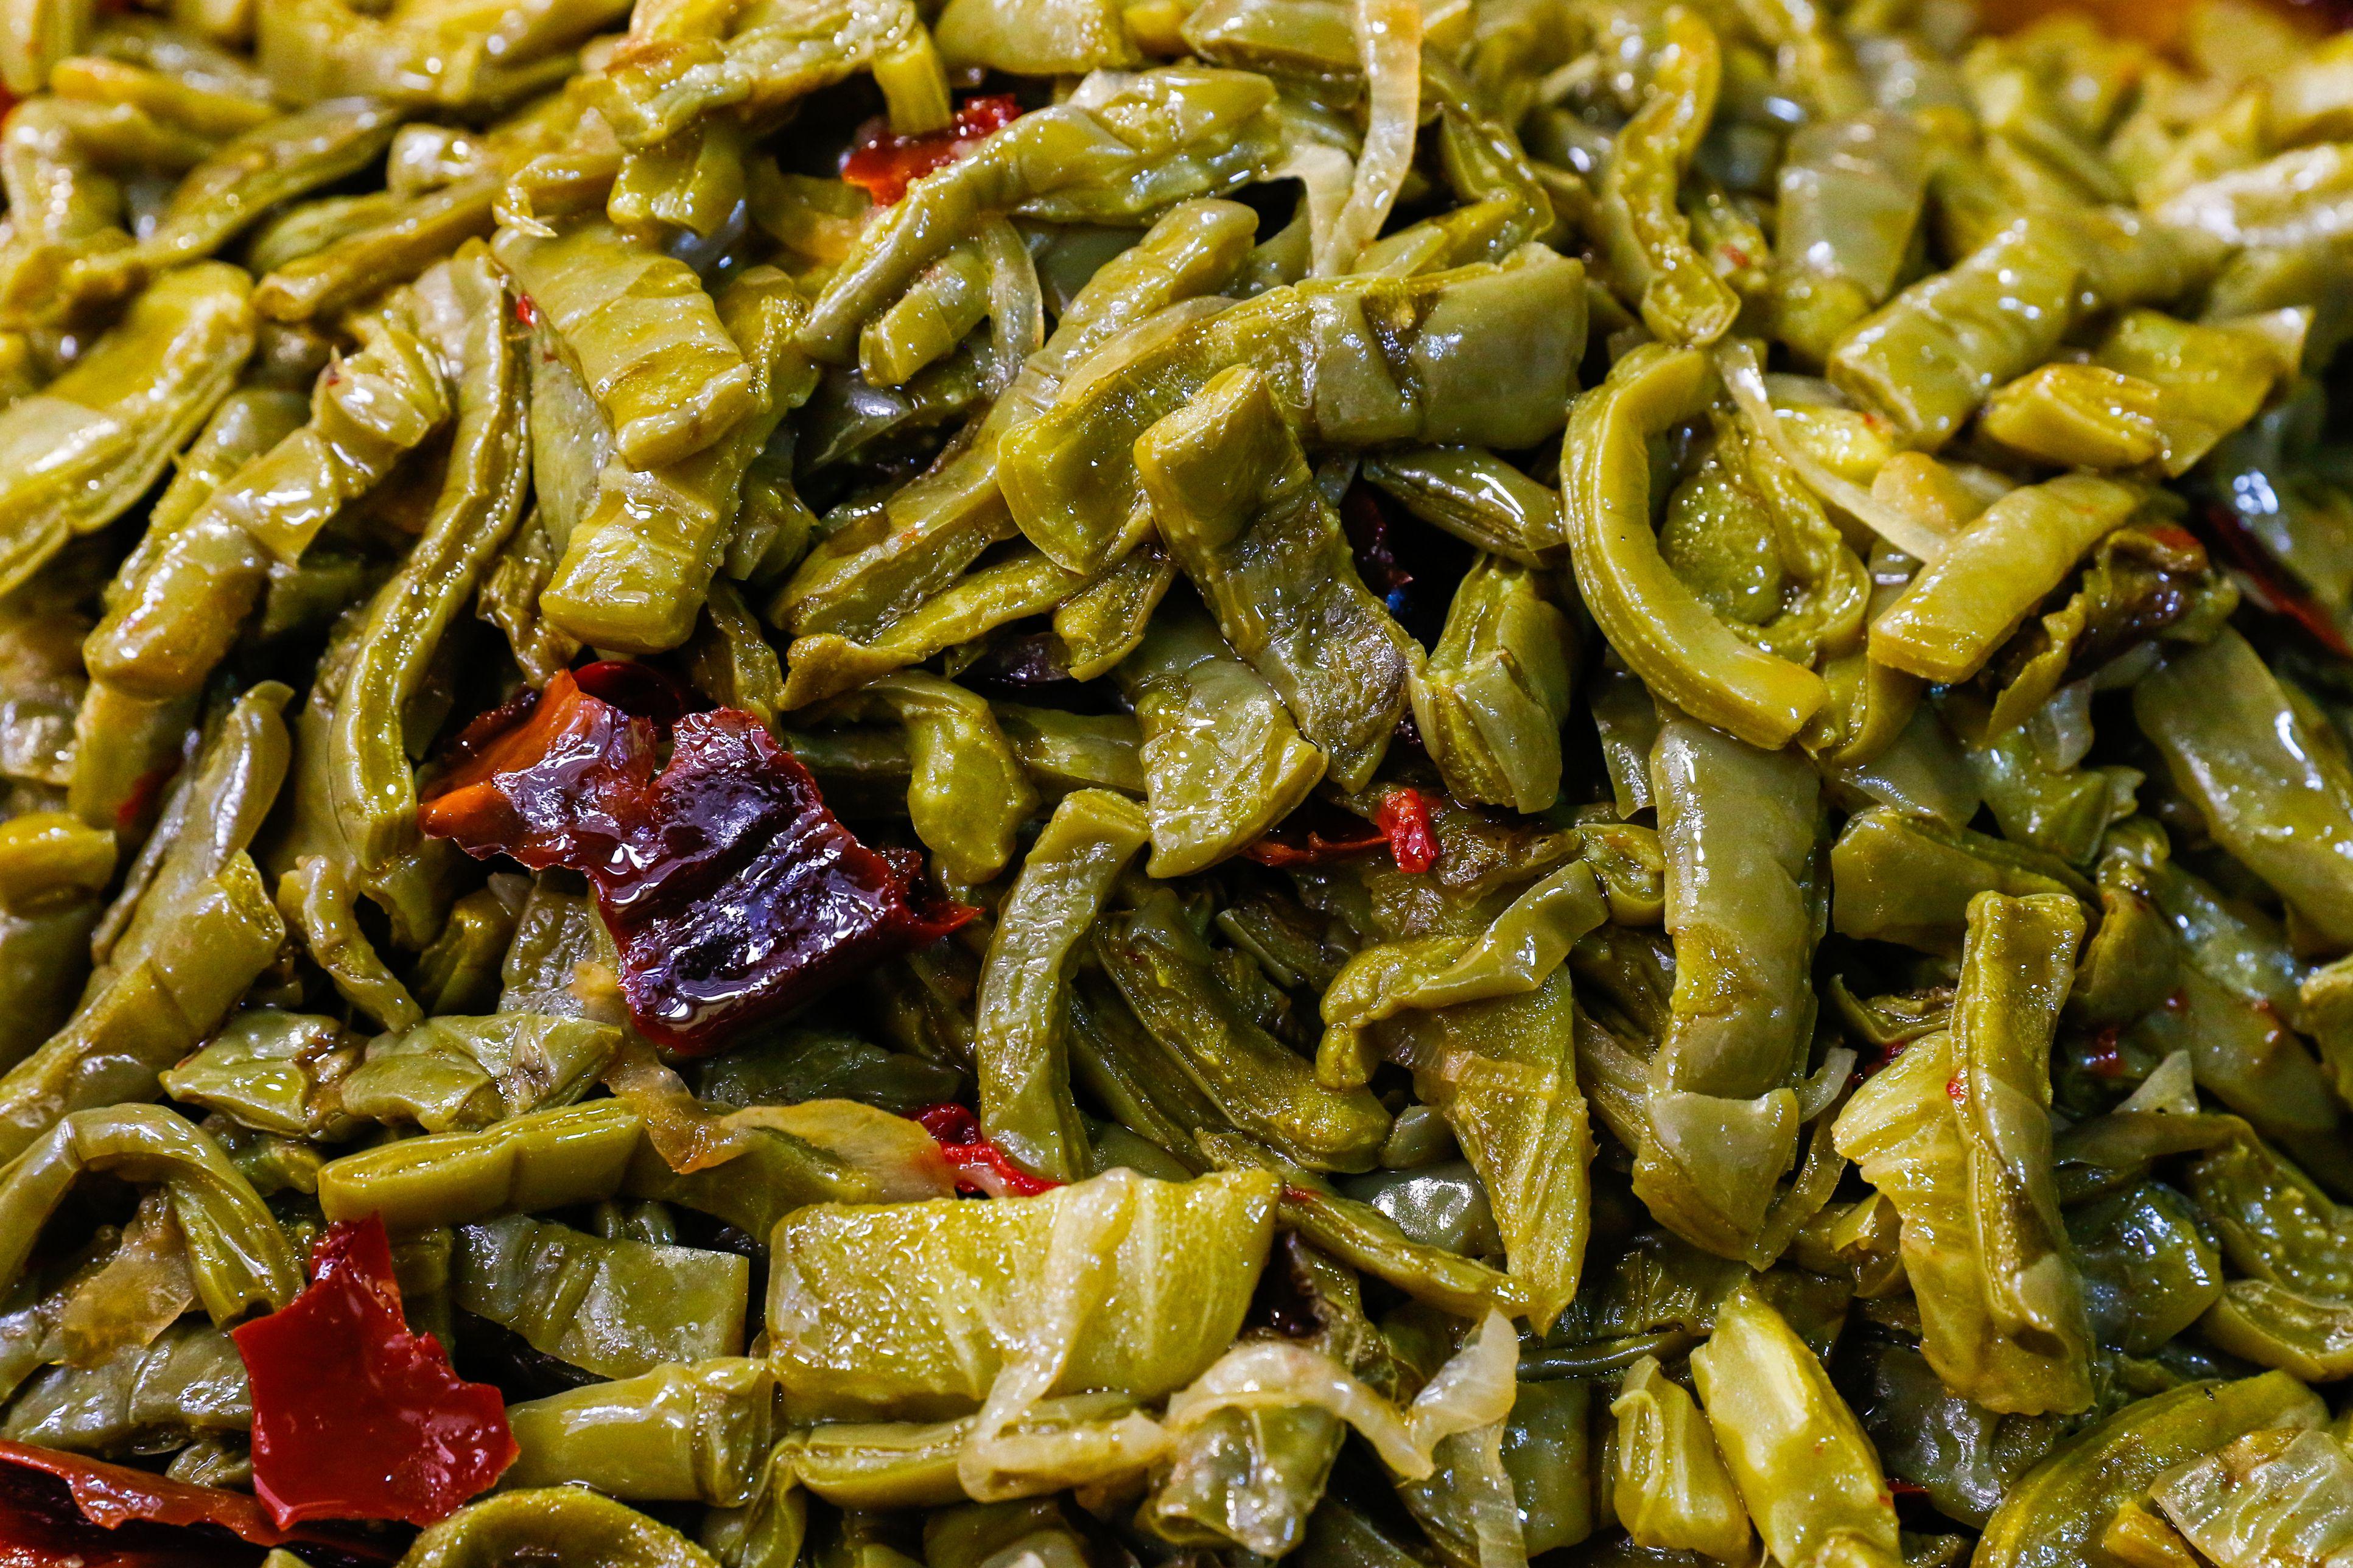 Prepared nopal cactus salad in a market in Tlalpan - Mexico City, Mexico